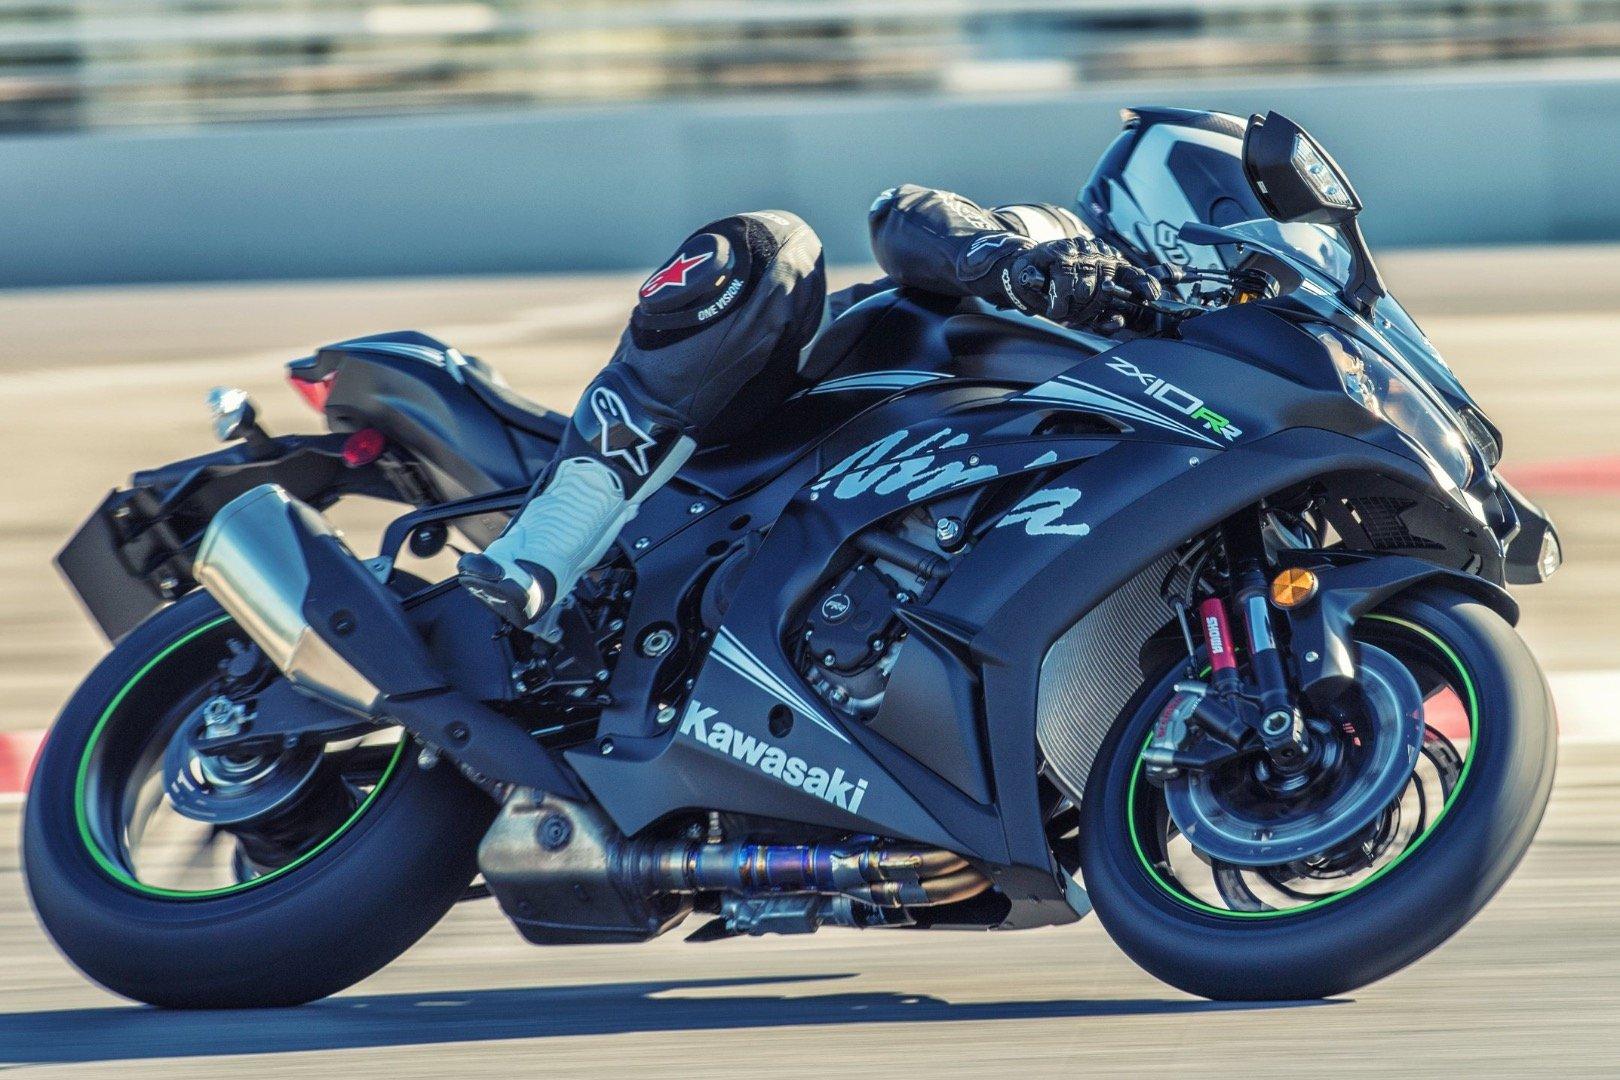 2017 Kawasaki Ninja Zx 10rr 6 Fast Facts World Superbike Ready